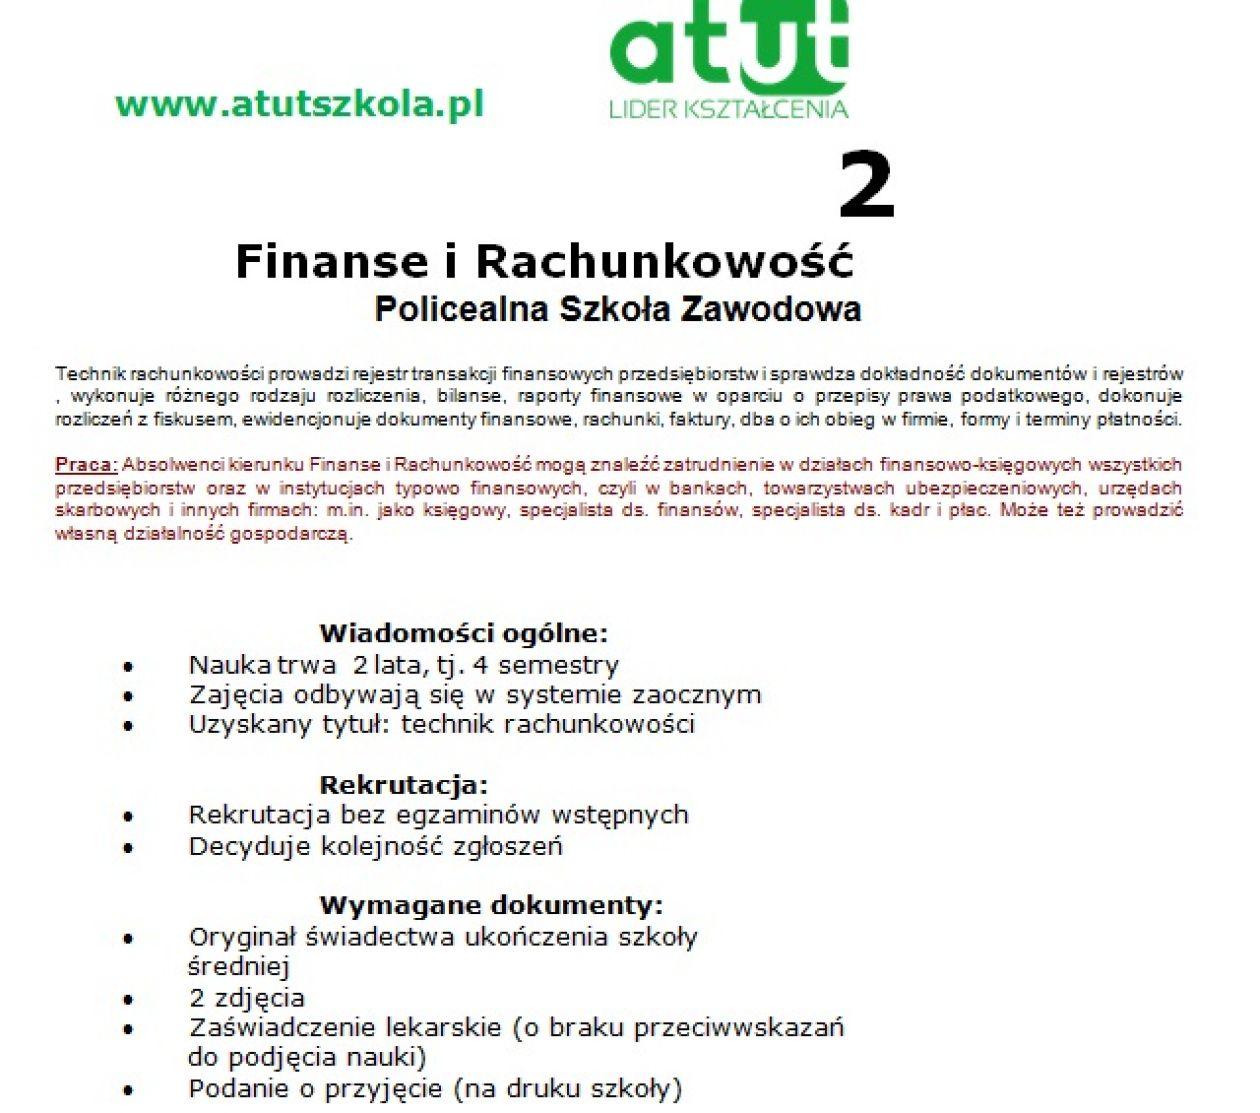 Atut Lider Kształcenia Technik Rachunkowości